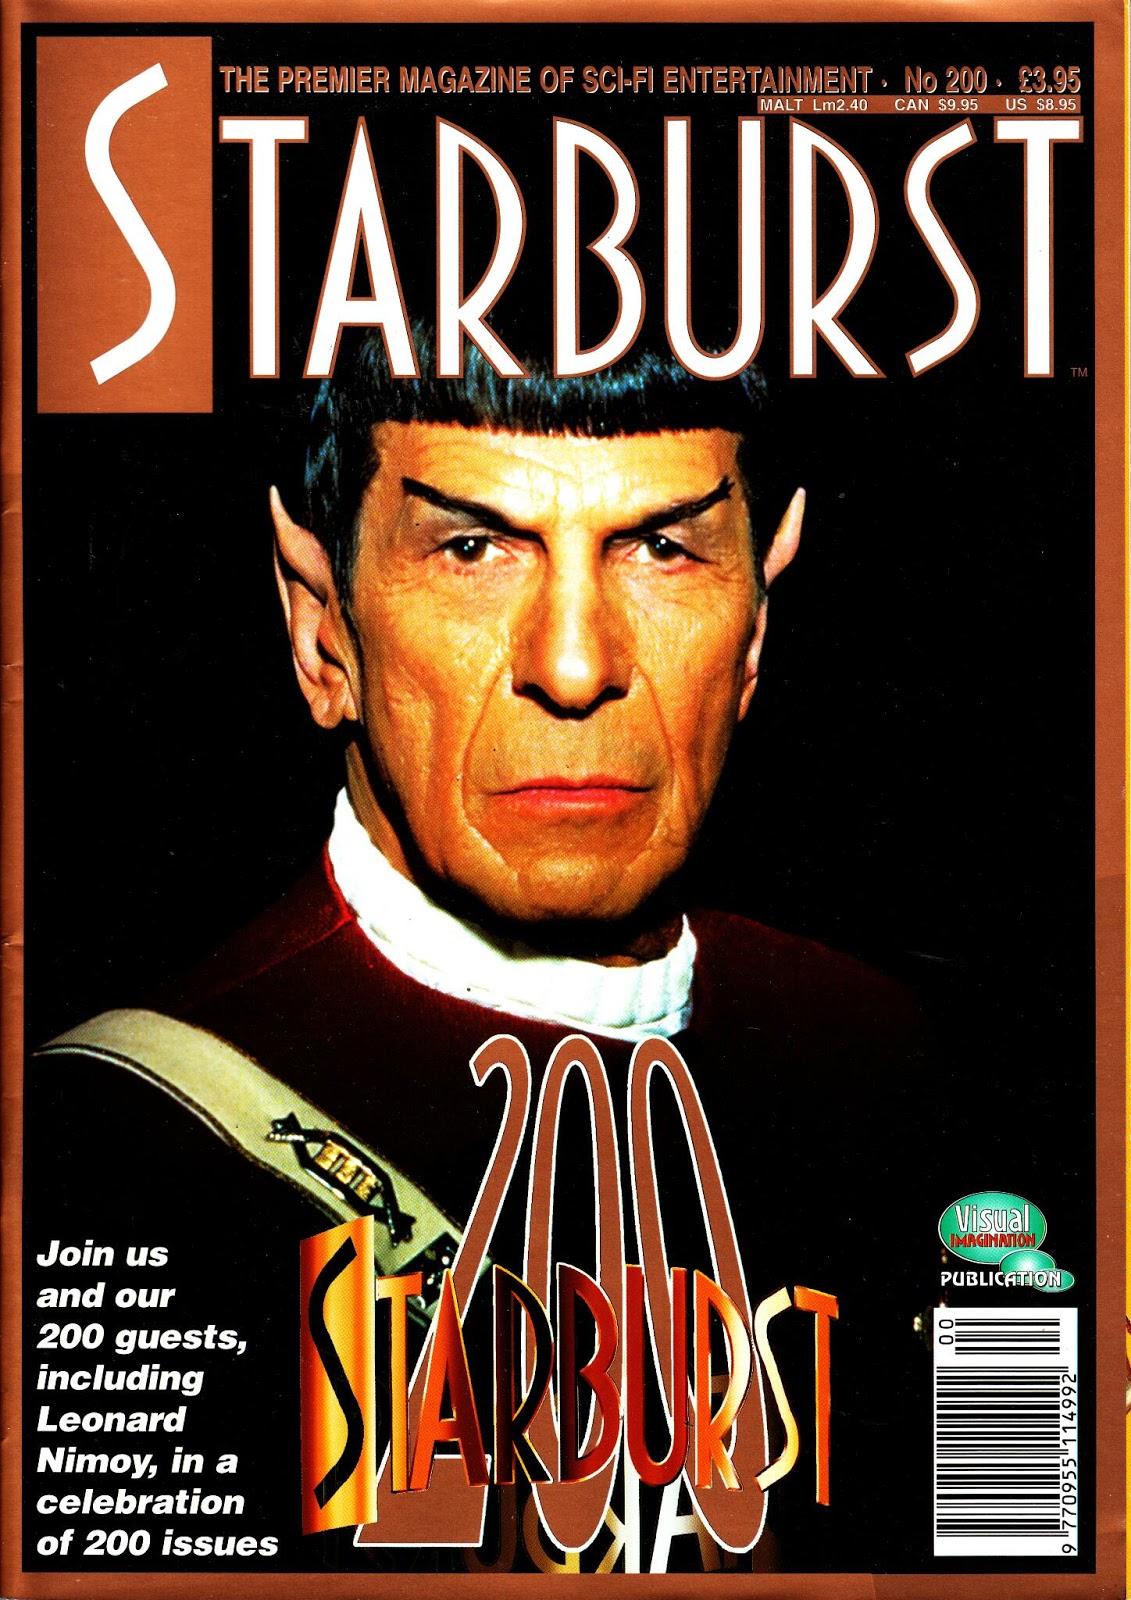 STARLOGGED - GEEK MEDIA AGAIN: 1995: STARBURST MAGAZINE ...